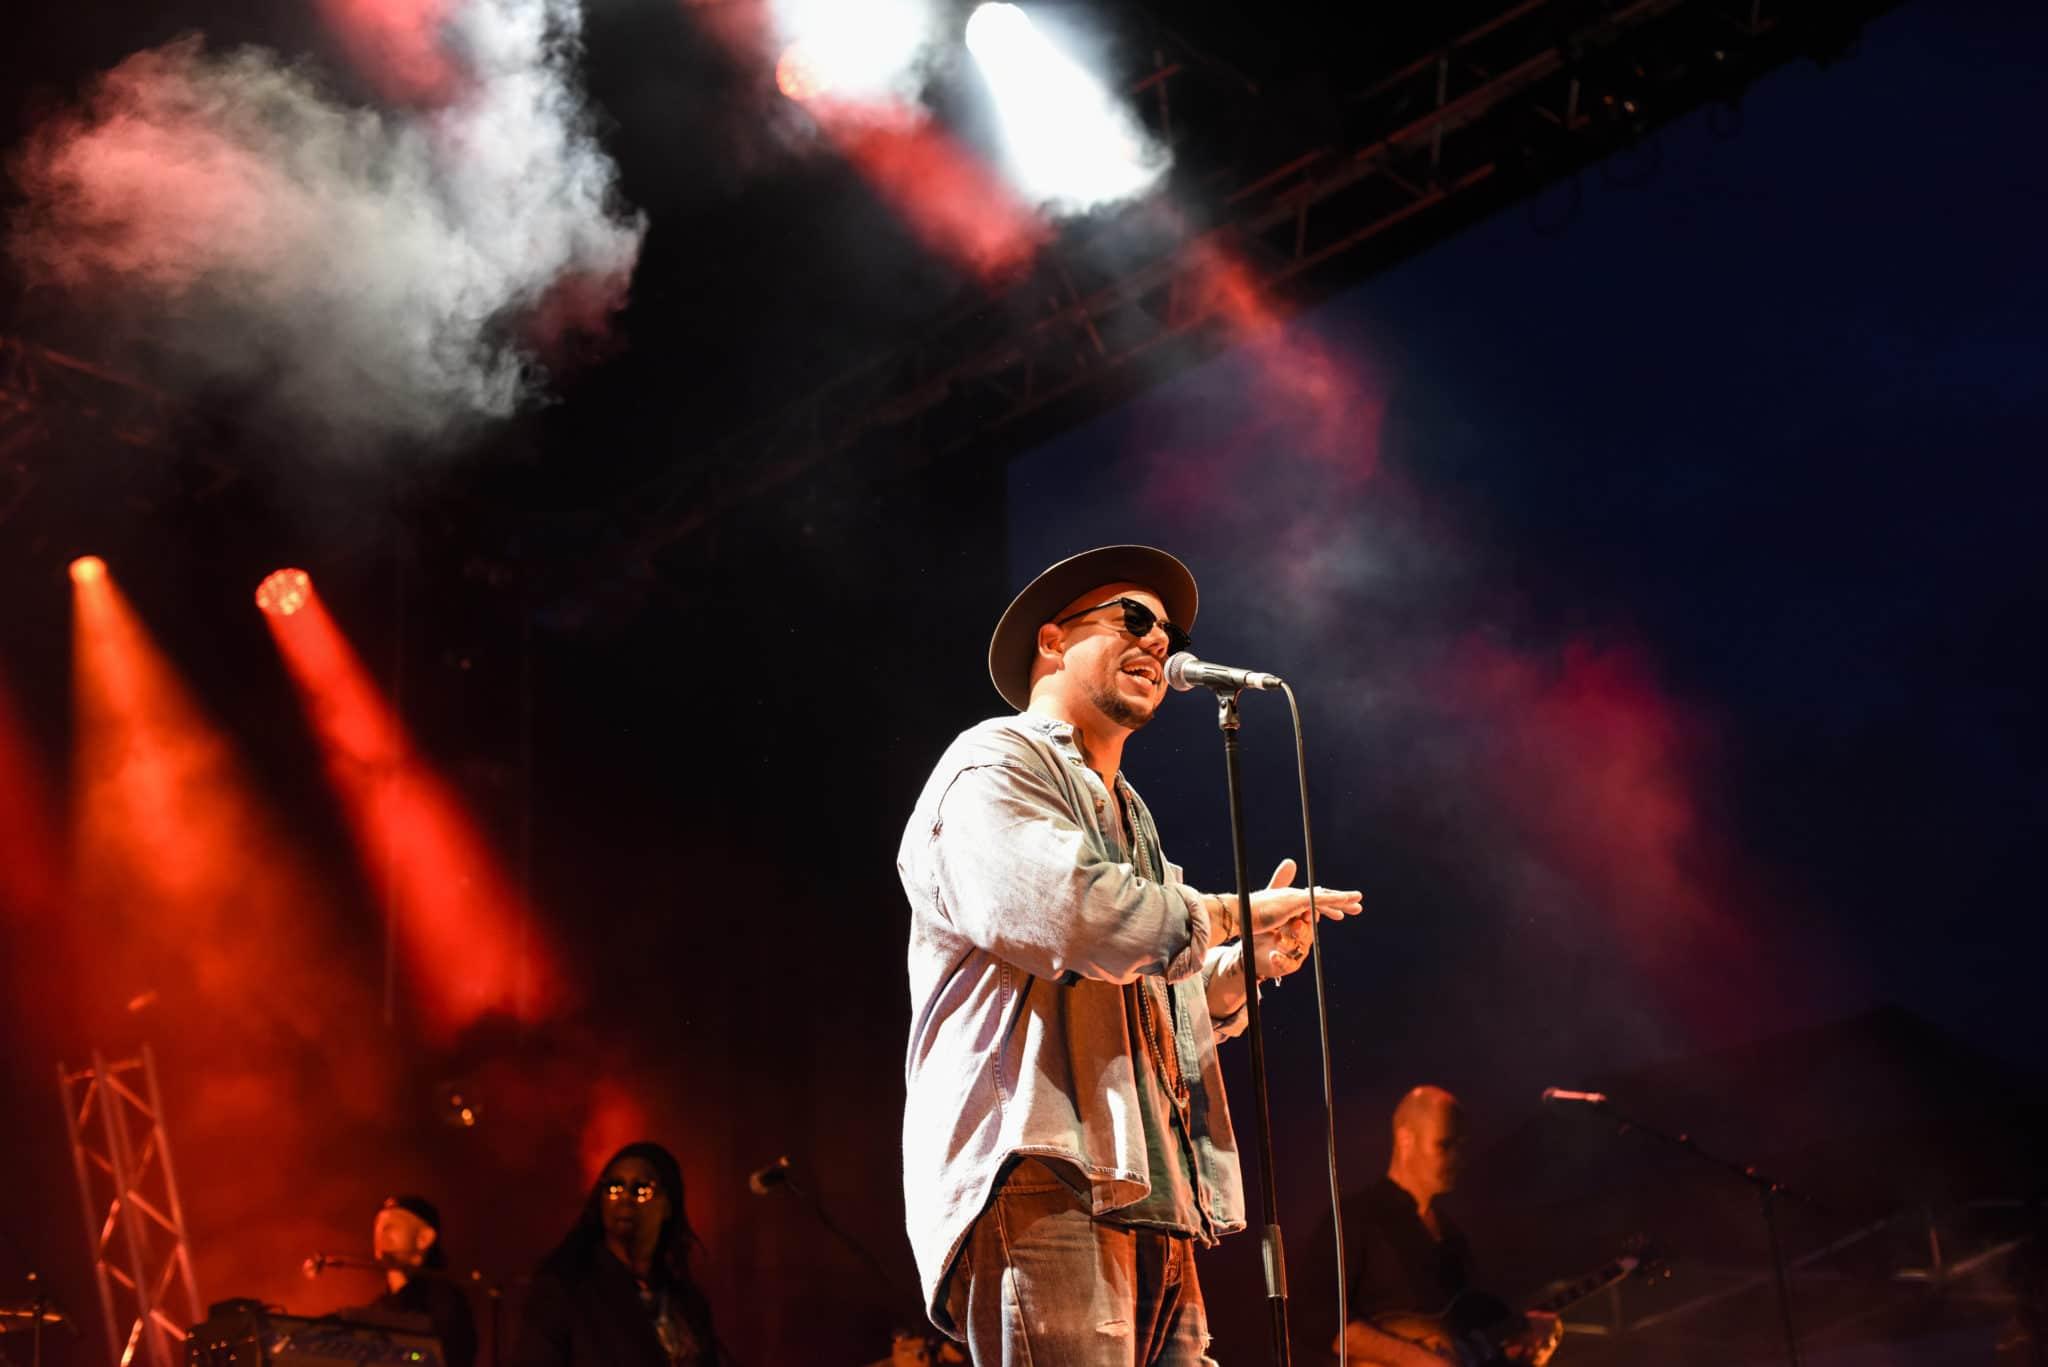 ben-loncle-soul-concert-live-micro-style-photo-lausanne-shooting